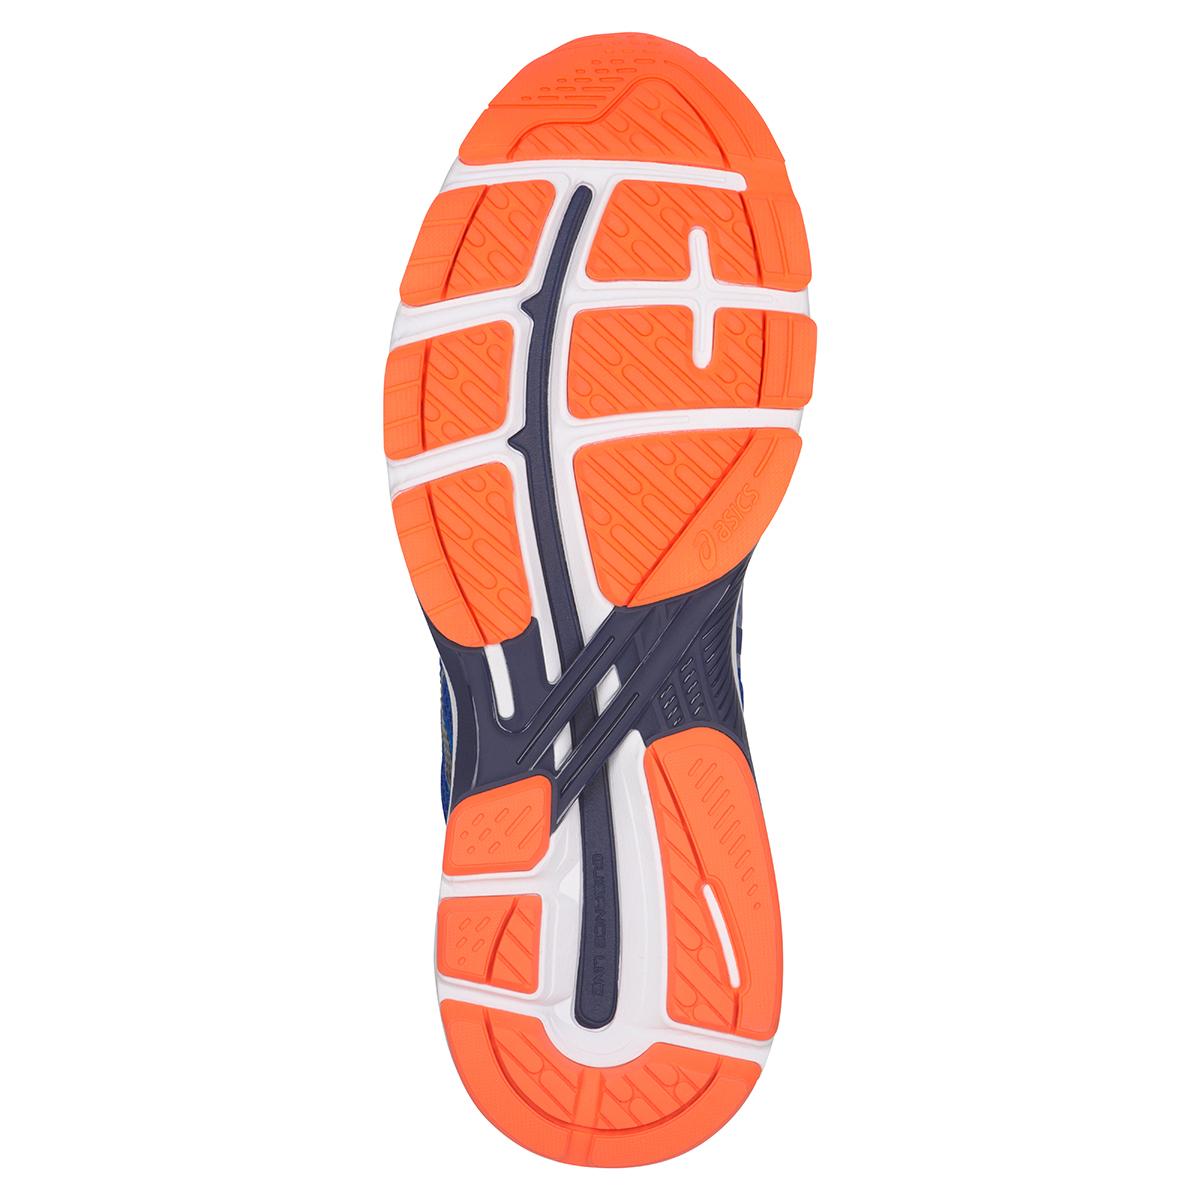 Men's Asics GT-2000 6 Running Shoe - Color: Imperial/Indigo (Regular Width) - Size: 10, Imperial/Indigo, large, image 4